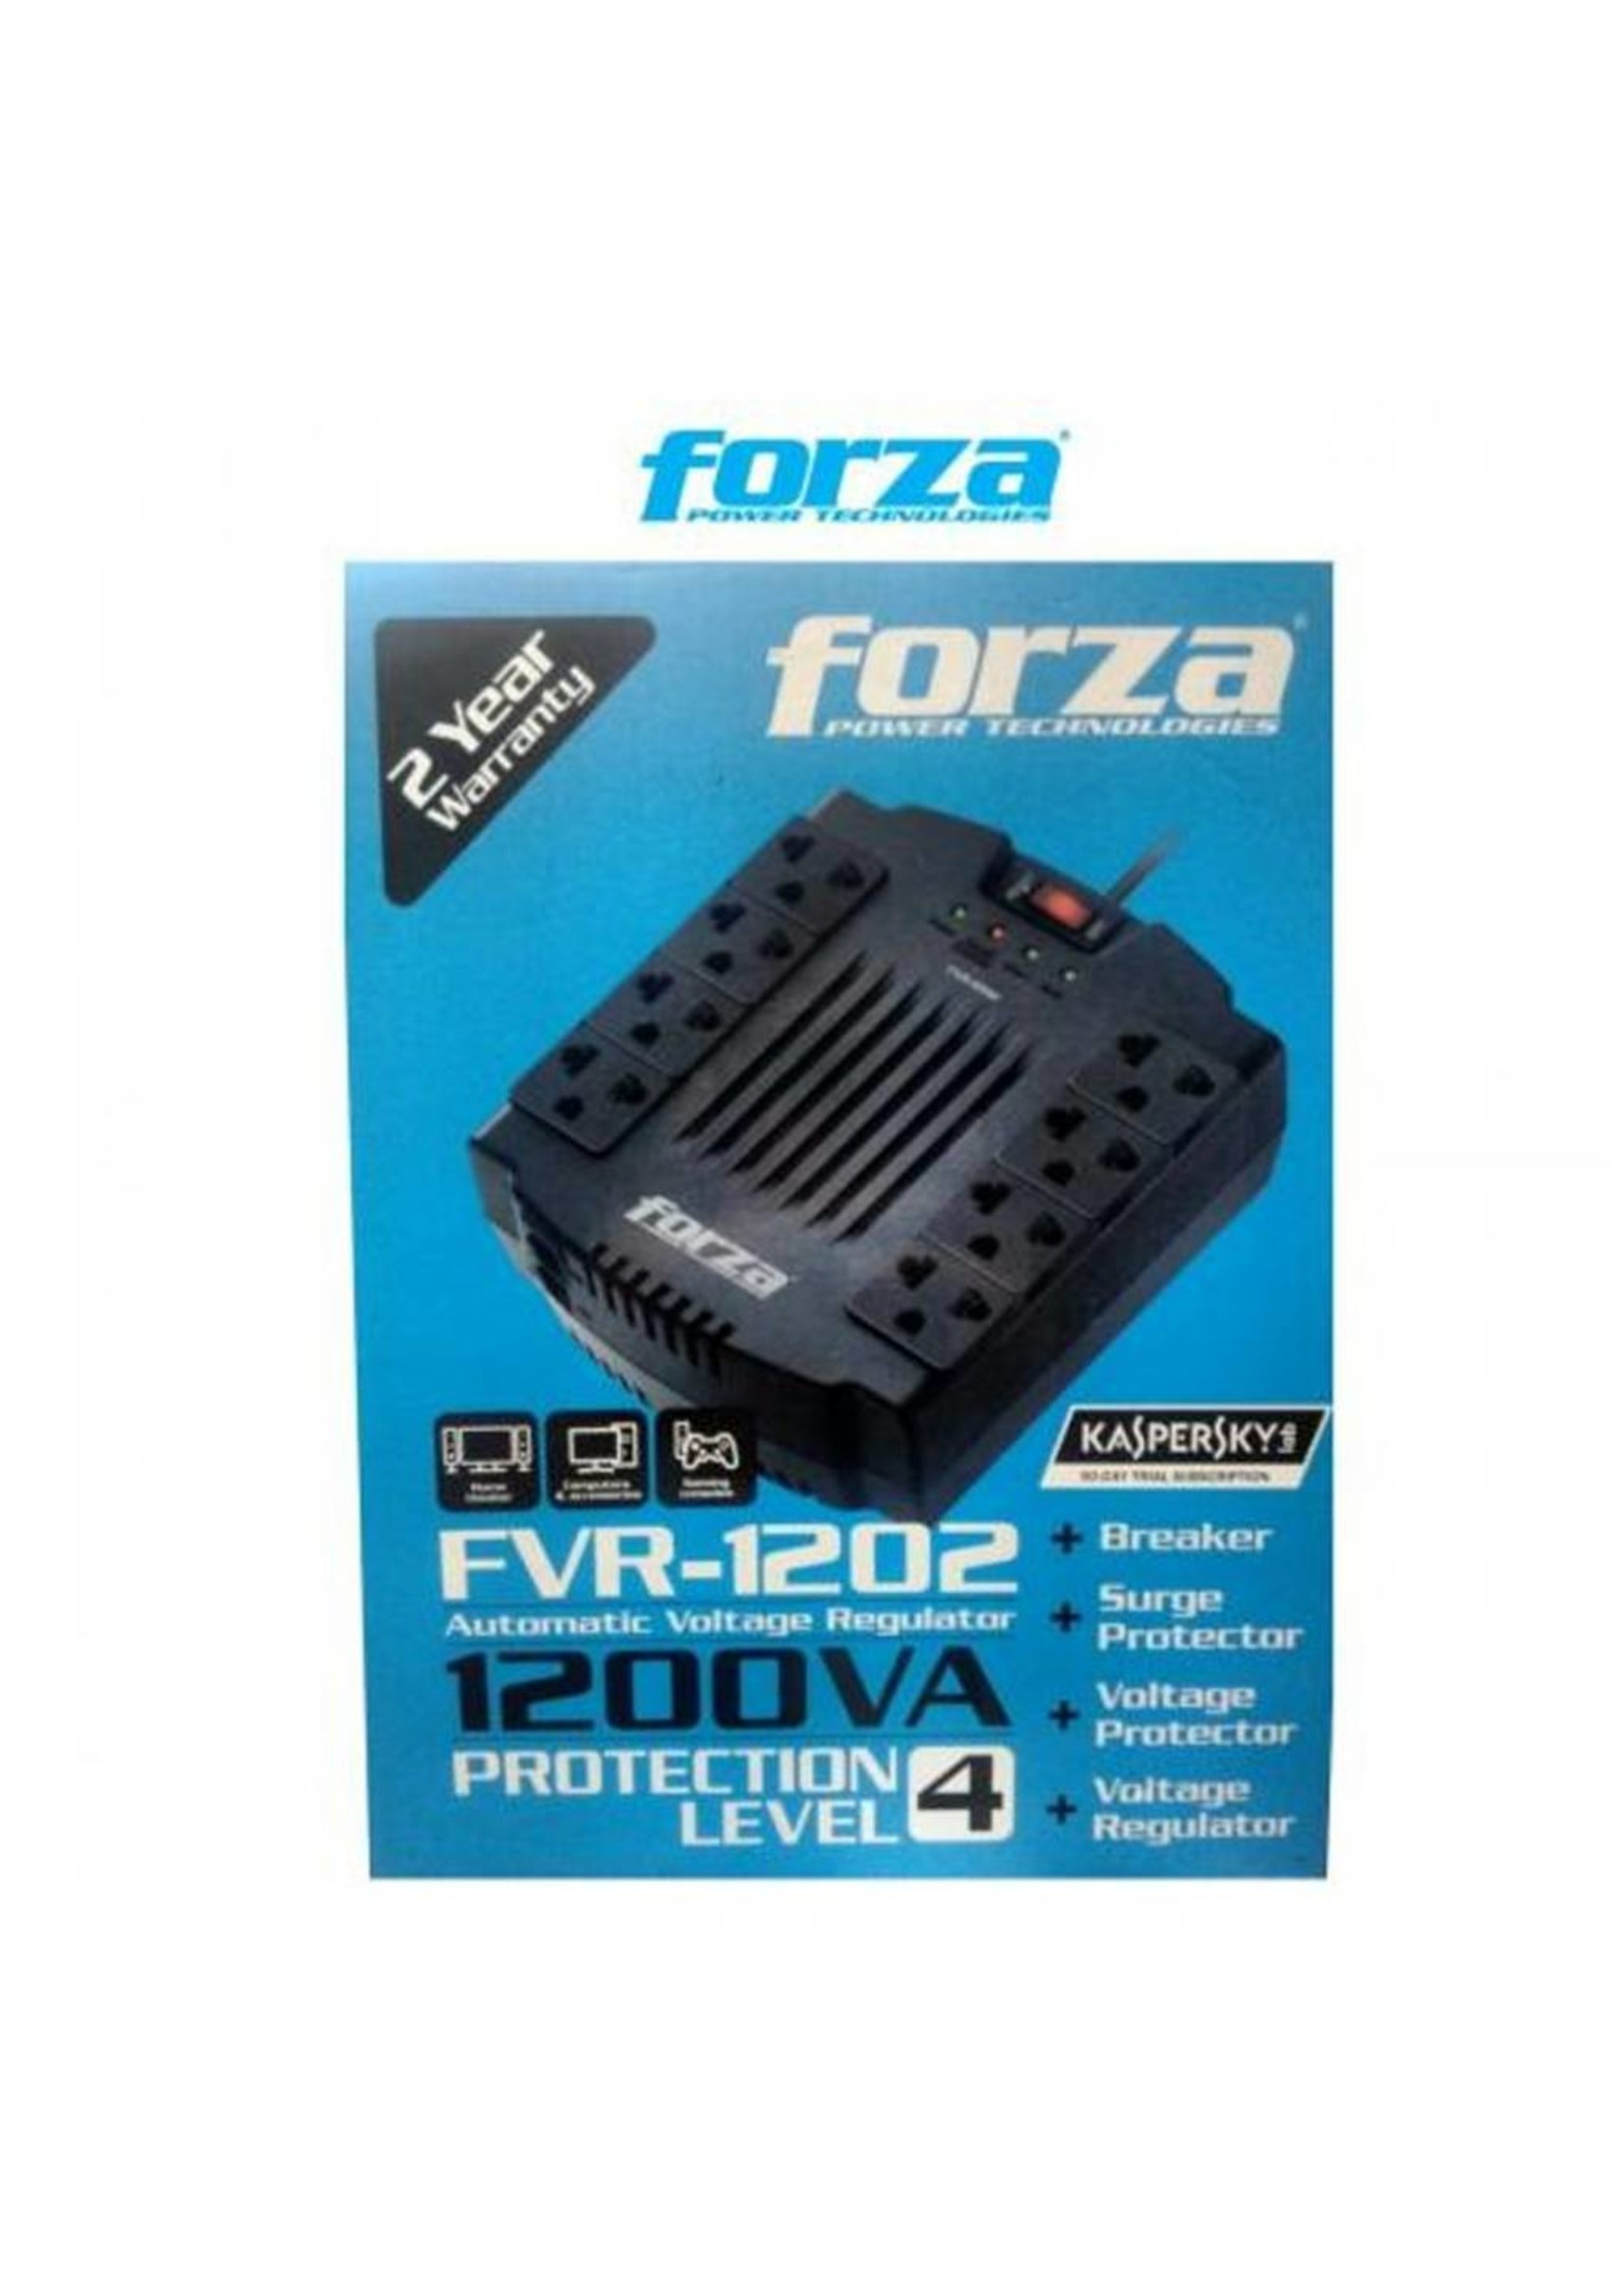 Forza / Maruson 1200VA Voltage Regulator